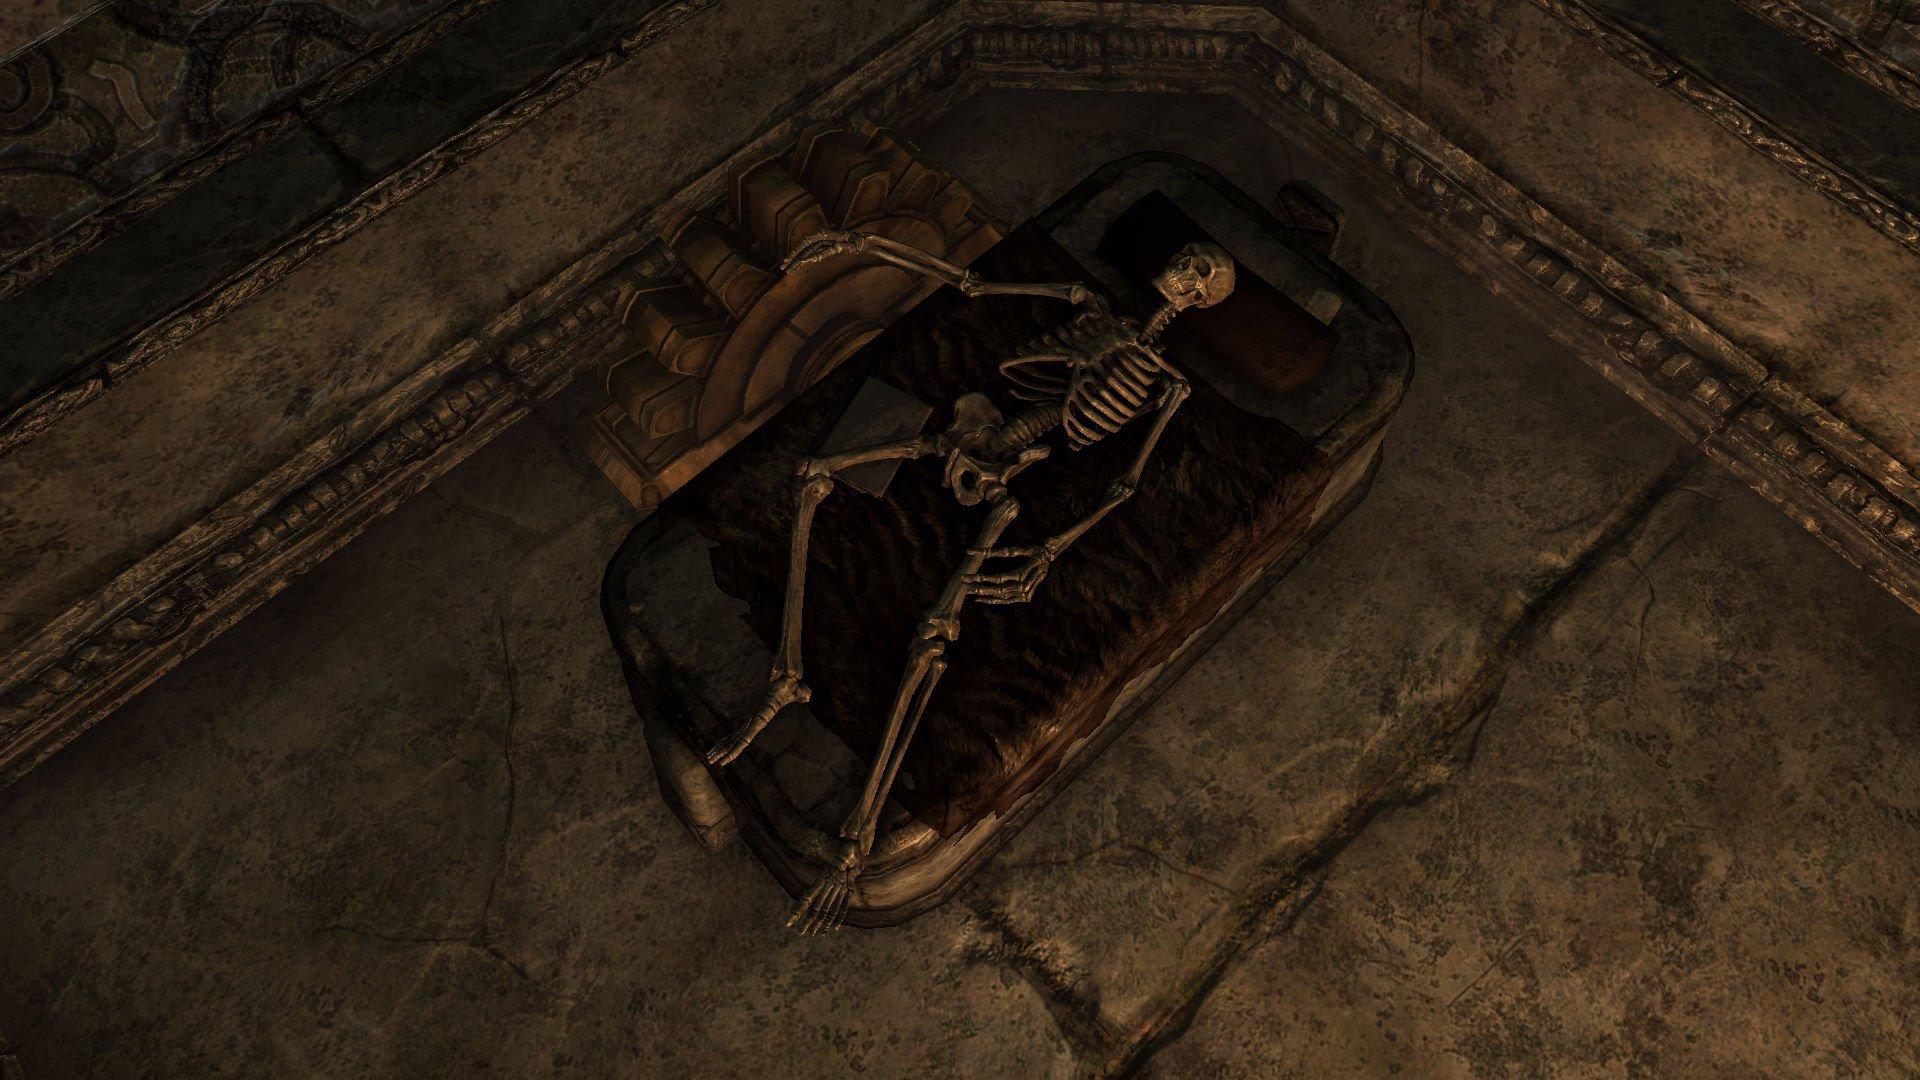 SkyrimSE Из жизни скелетов. Зачитался